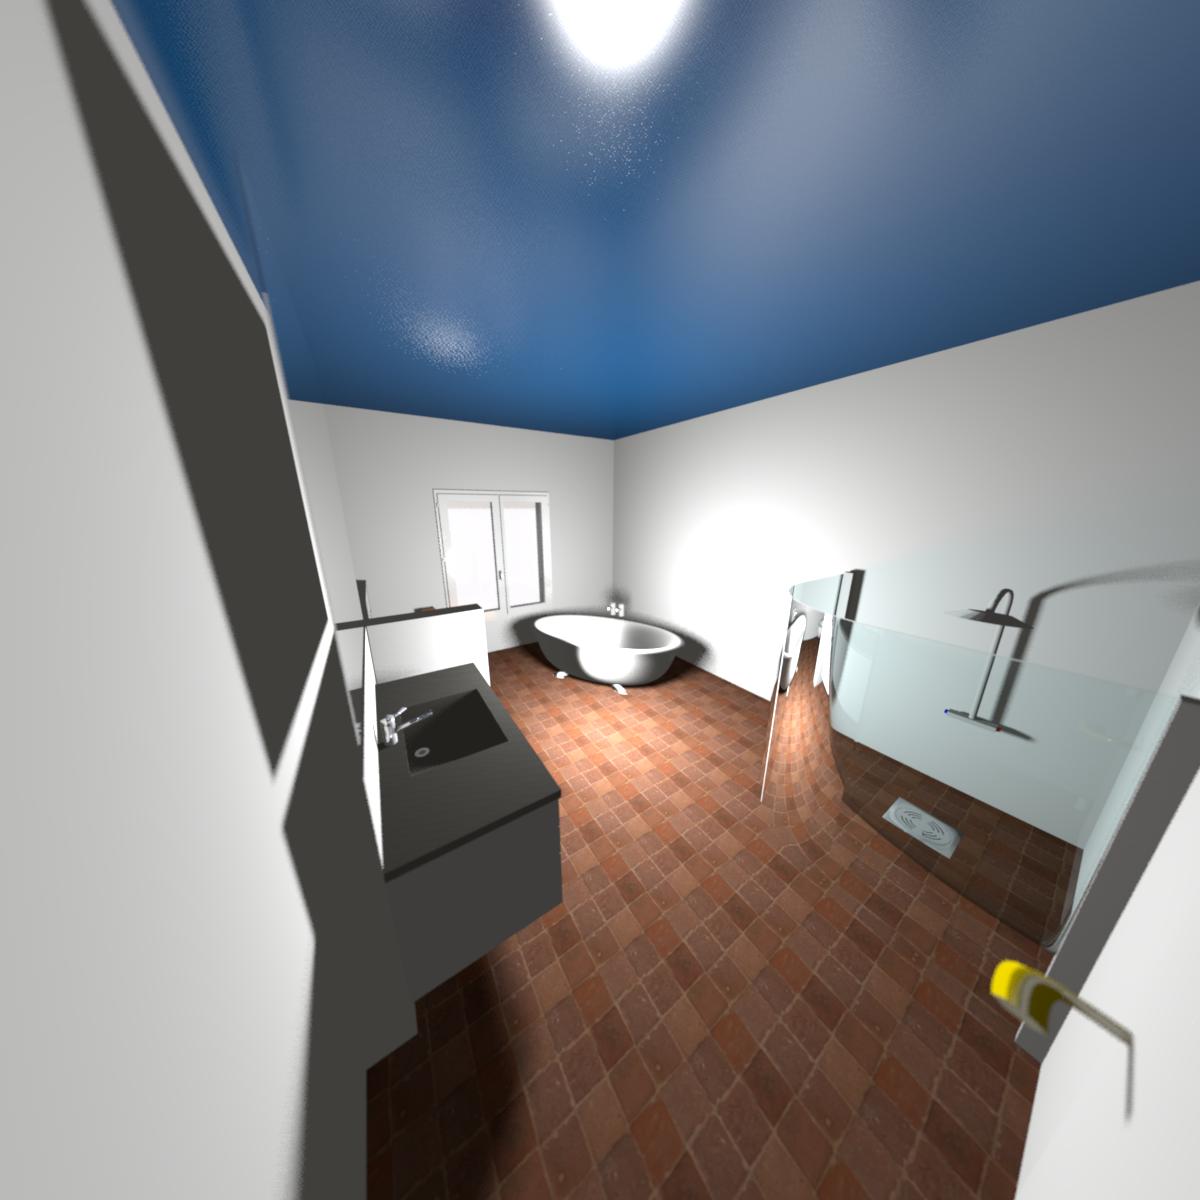 frei stehende badewanne haus im selbstbau. Black Bedroom Furniture Sets. Home Design Ideas